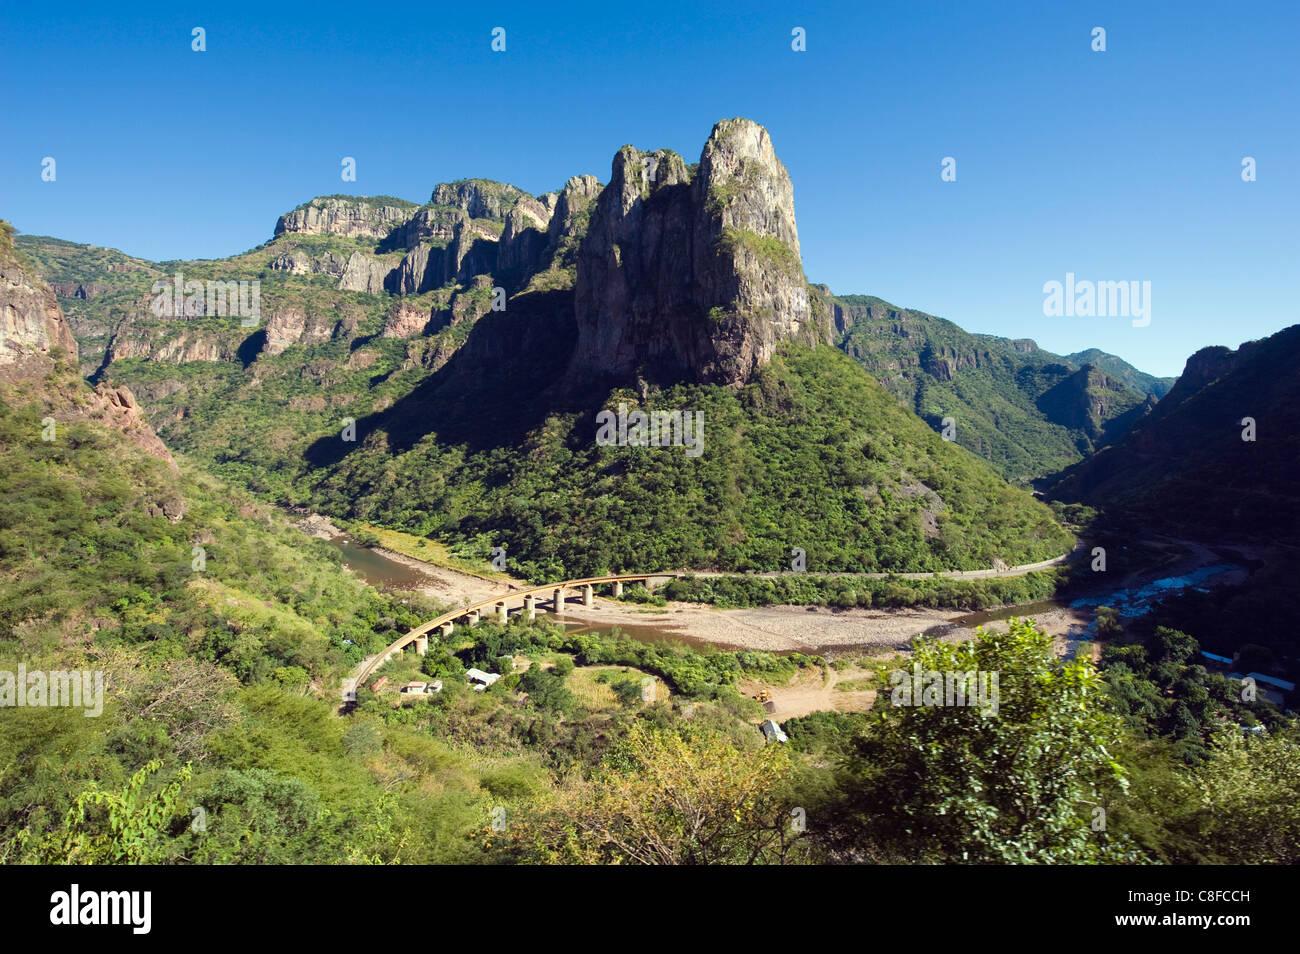 El Chepe railway journey through Barranca del Cobre (Copper Canyon, Chihuahua state, Mexico - Stock Image